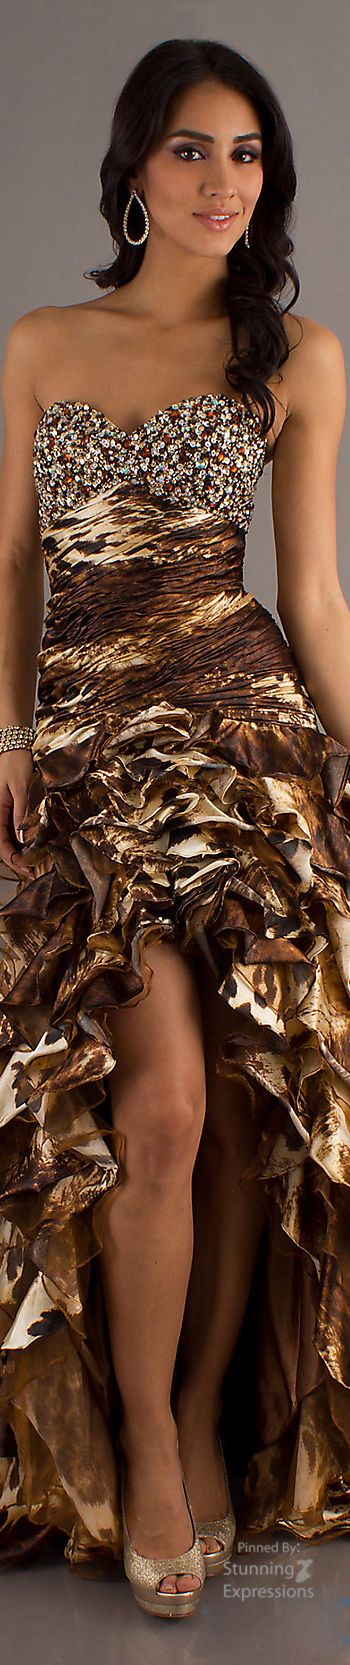 animalprint.quenalbertini: Animal Print and Gold Couture